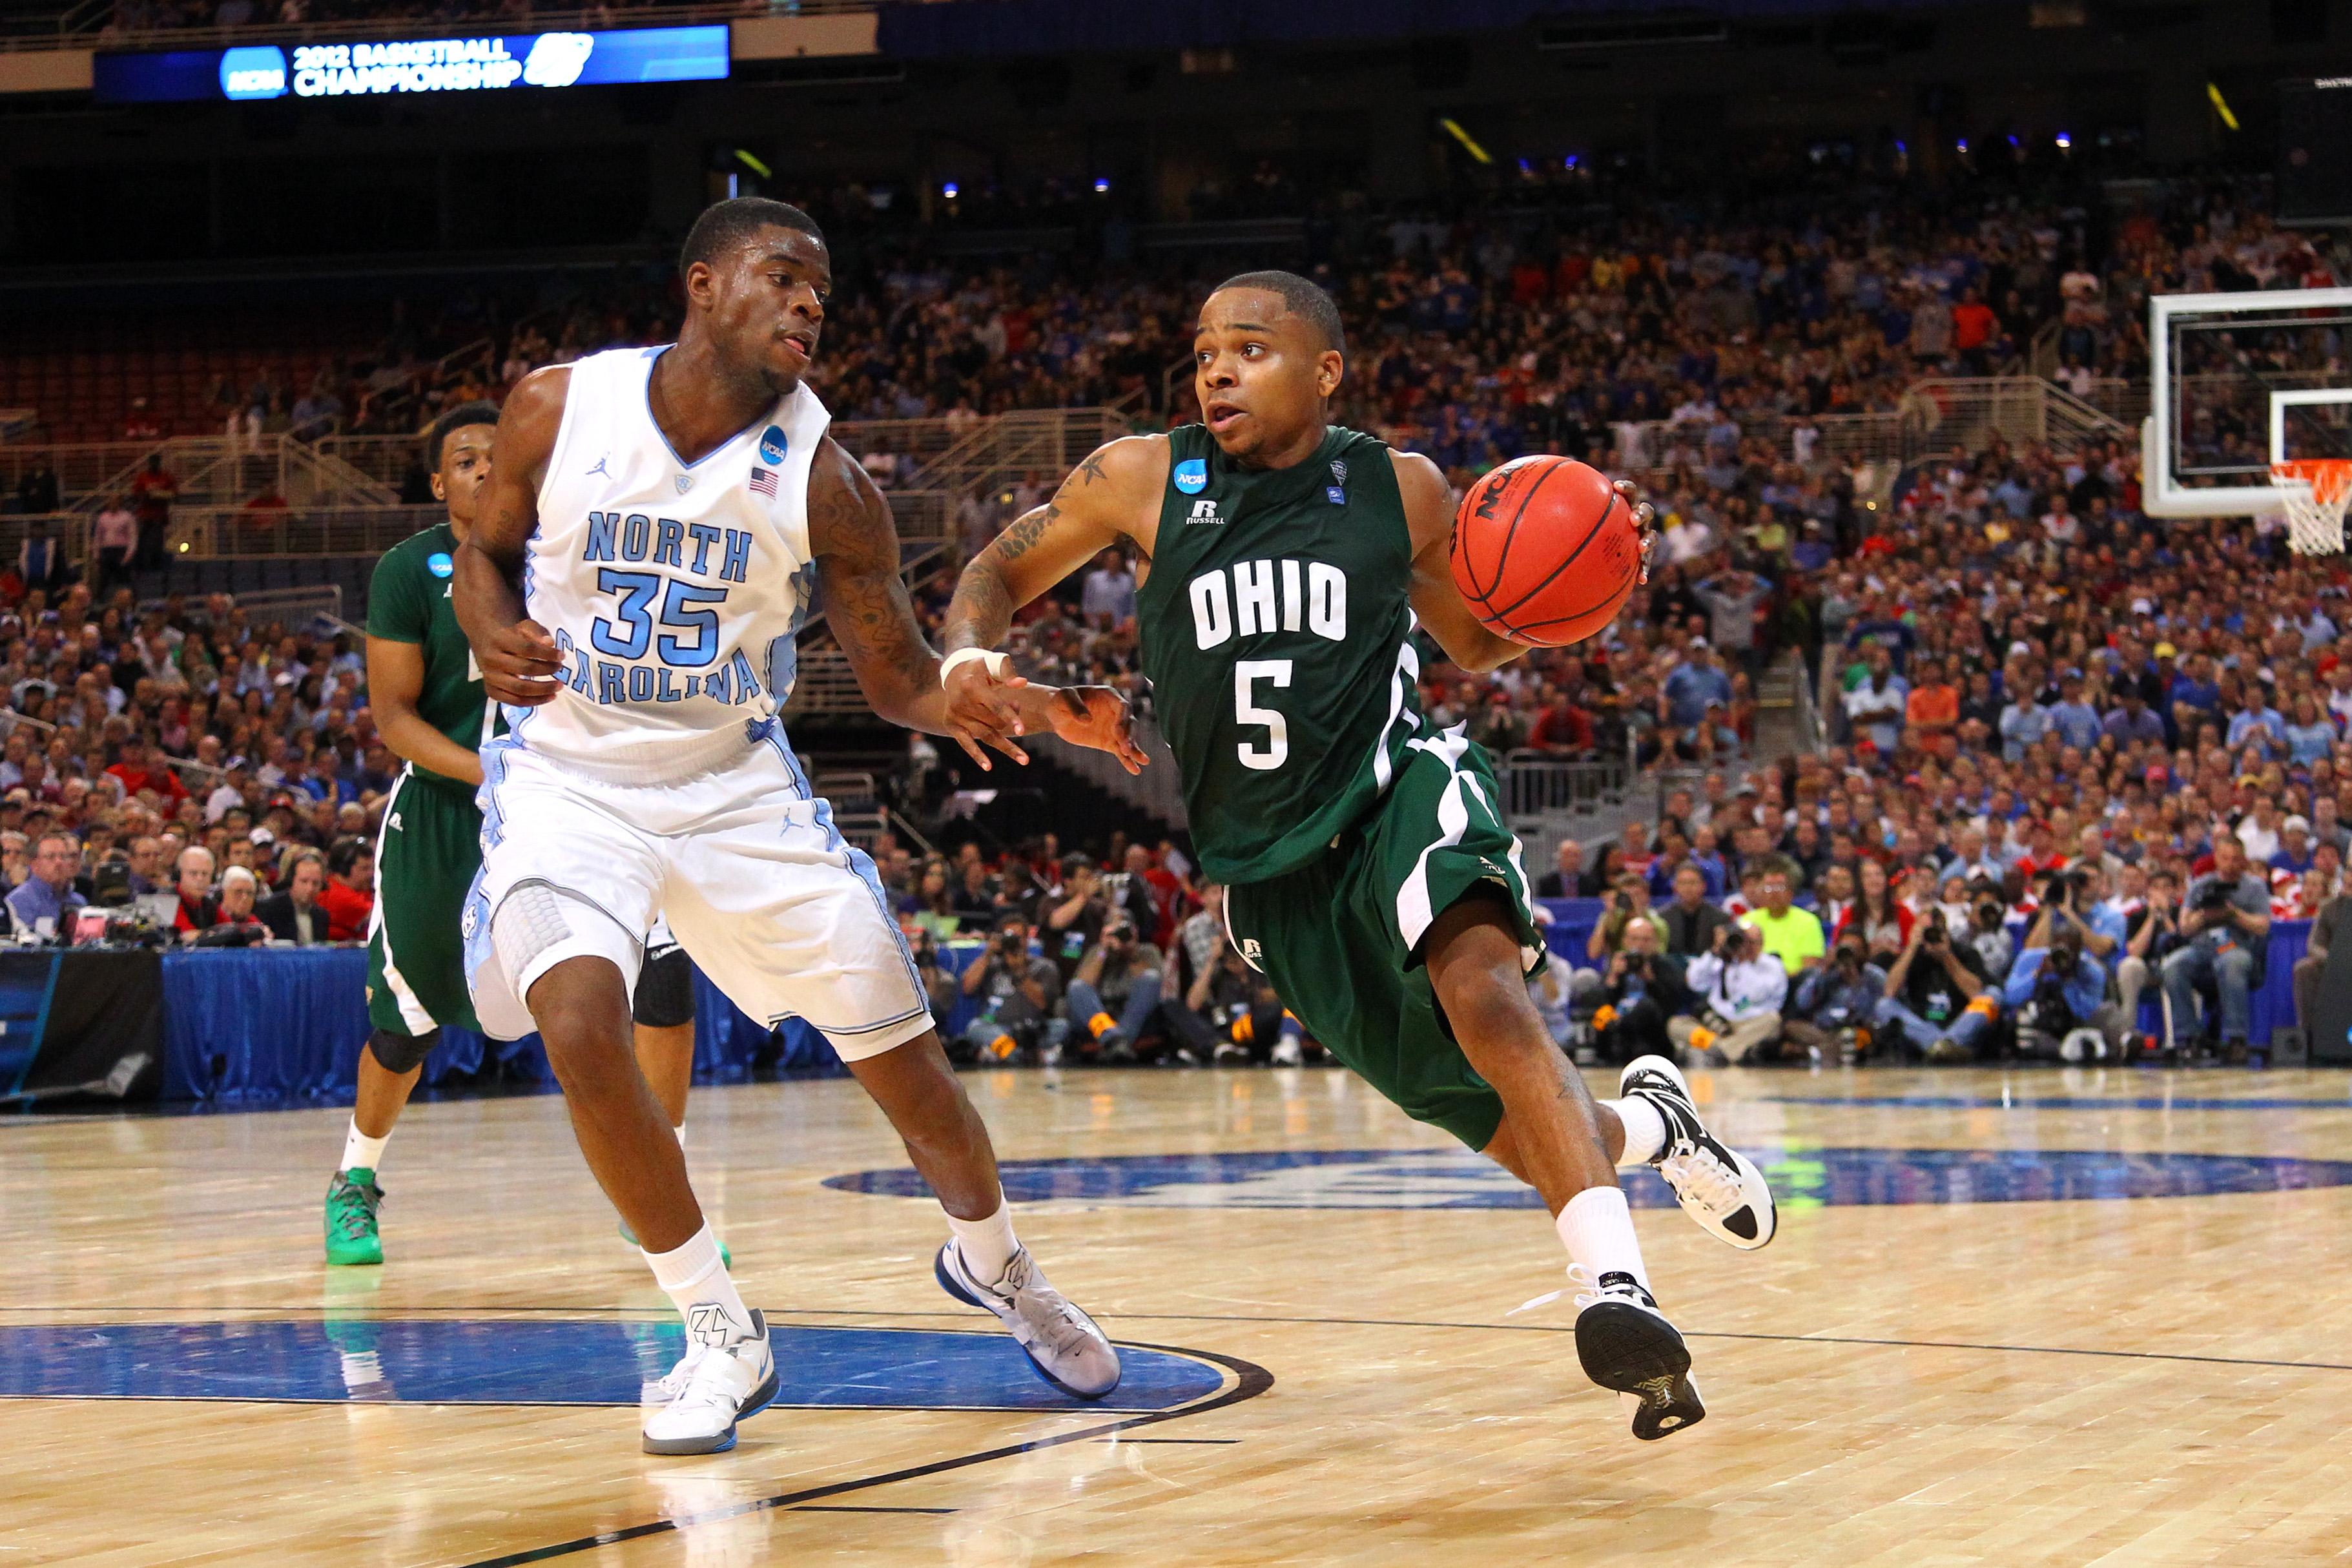 NCAA Basketball Tournament - Ohio v North Carolina